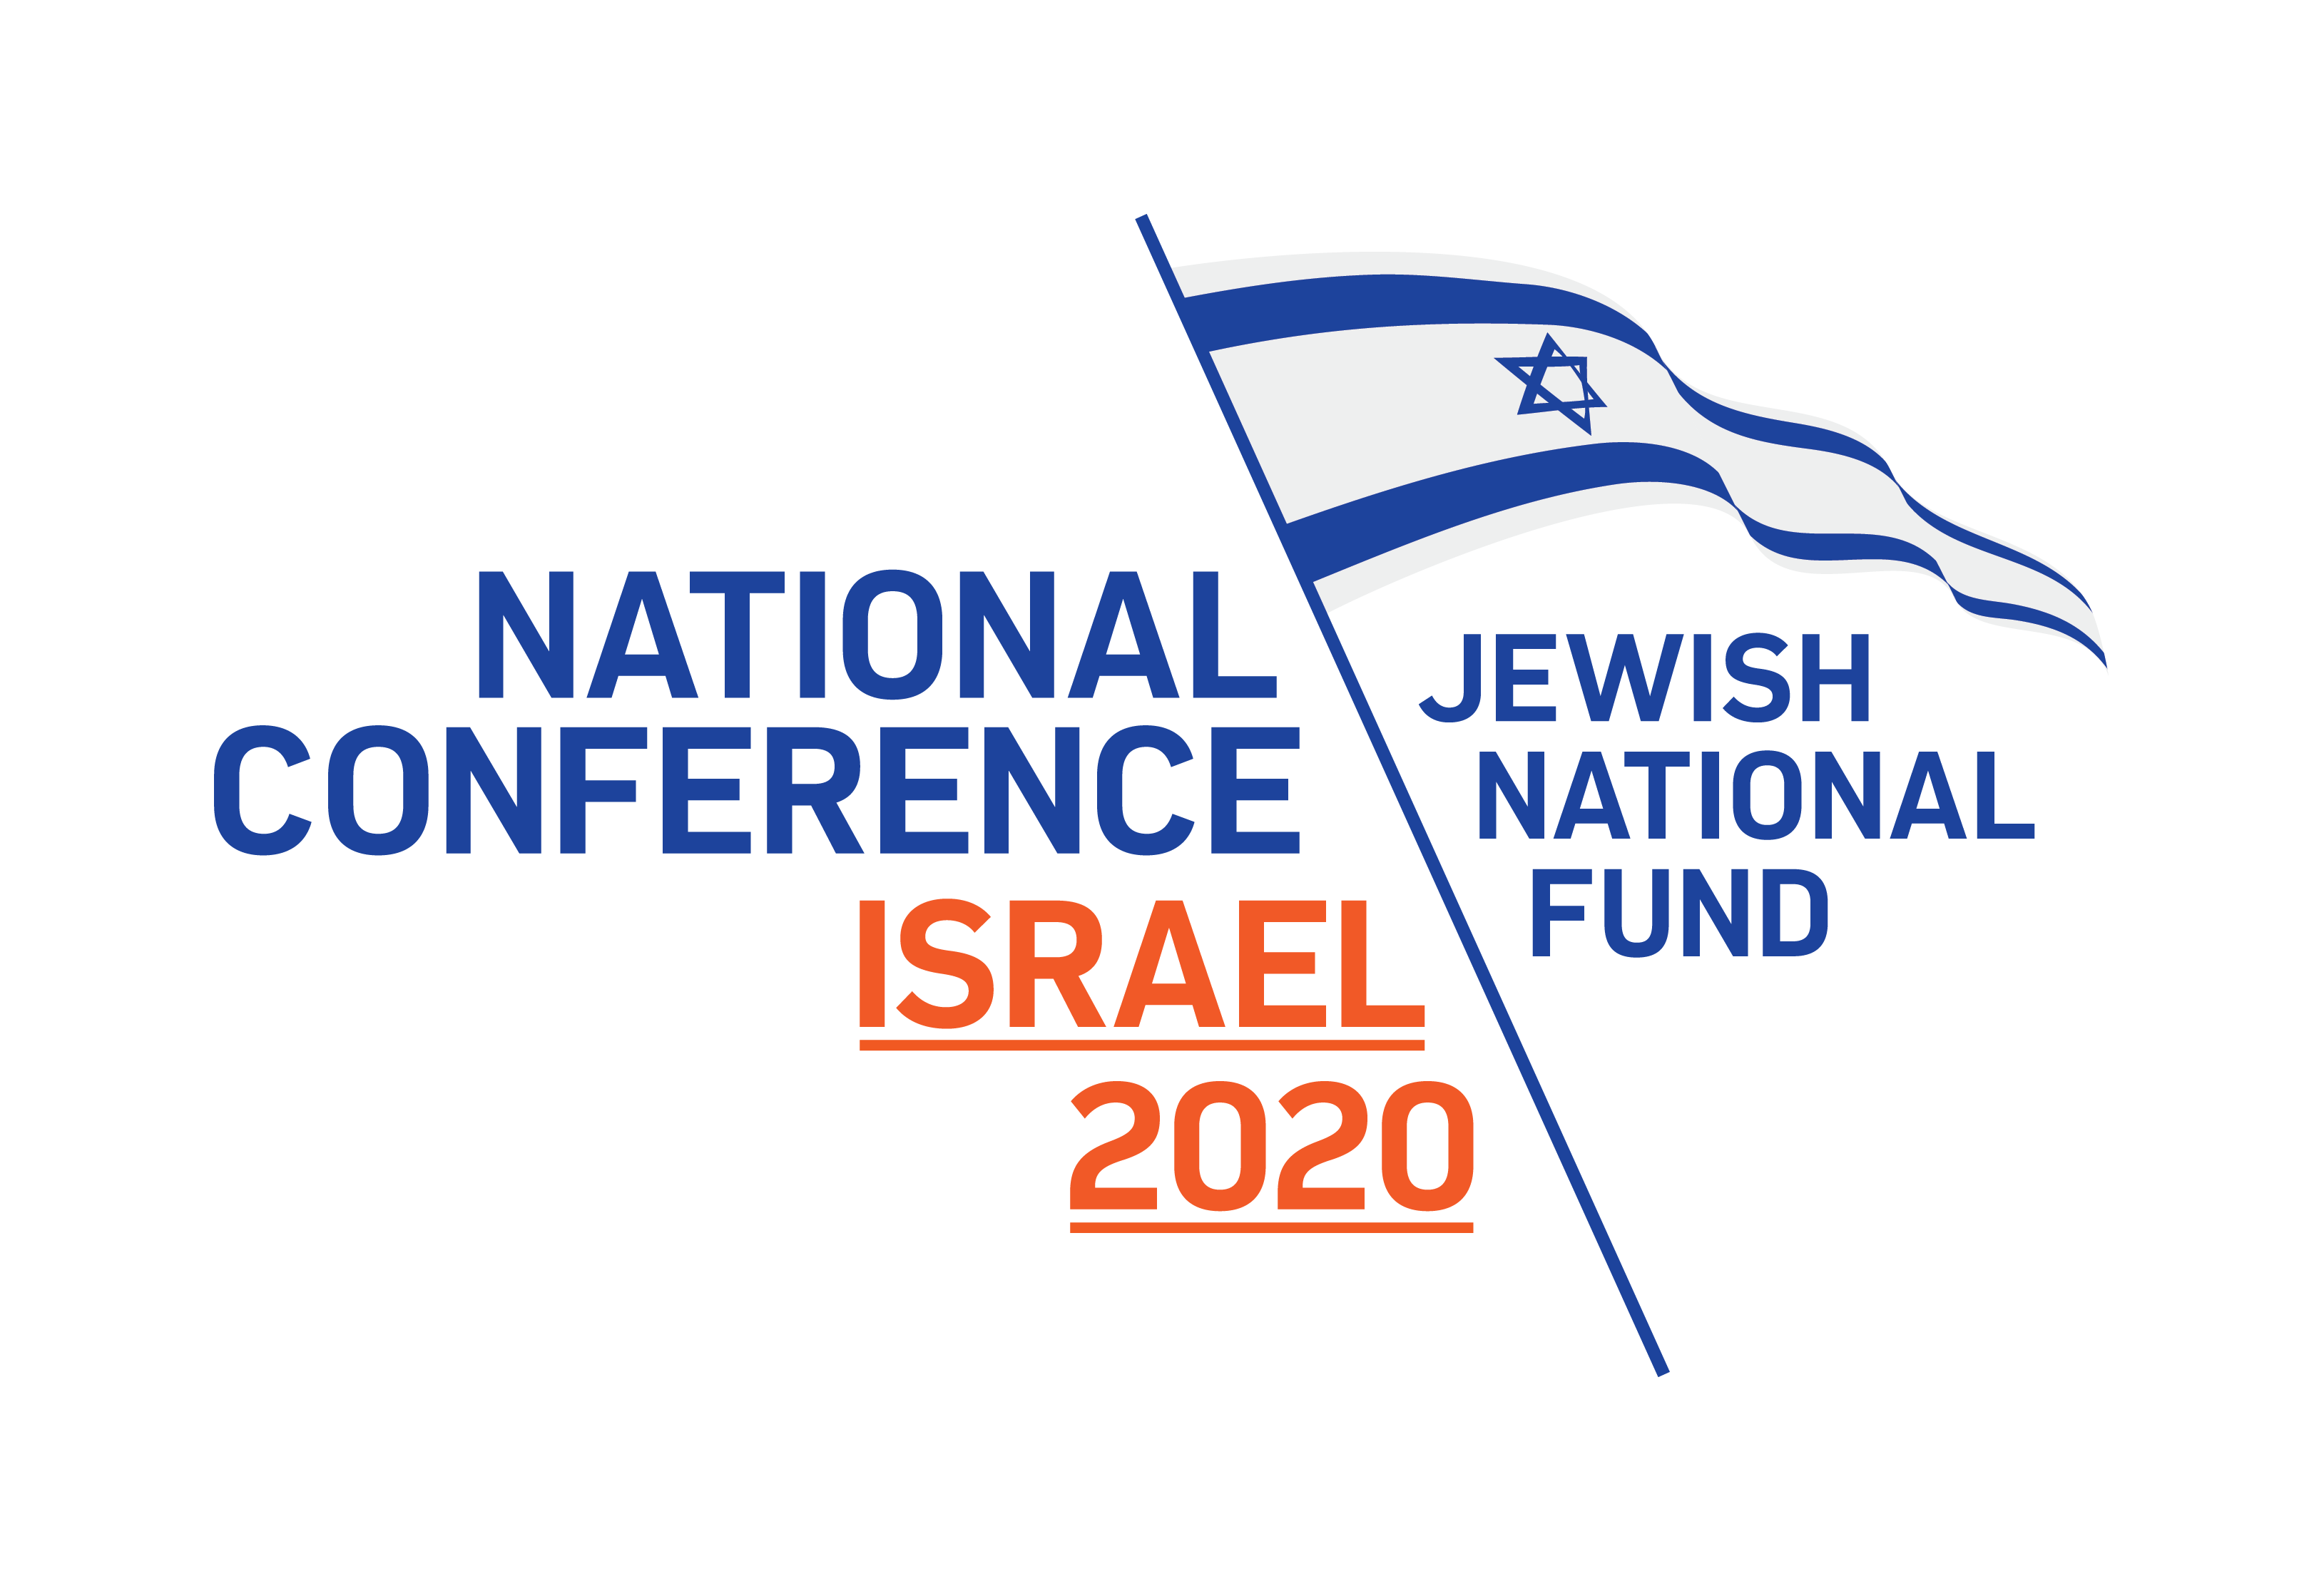 Logo_National Conference_Israel 2020